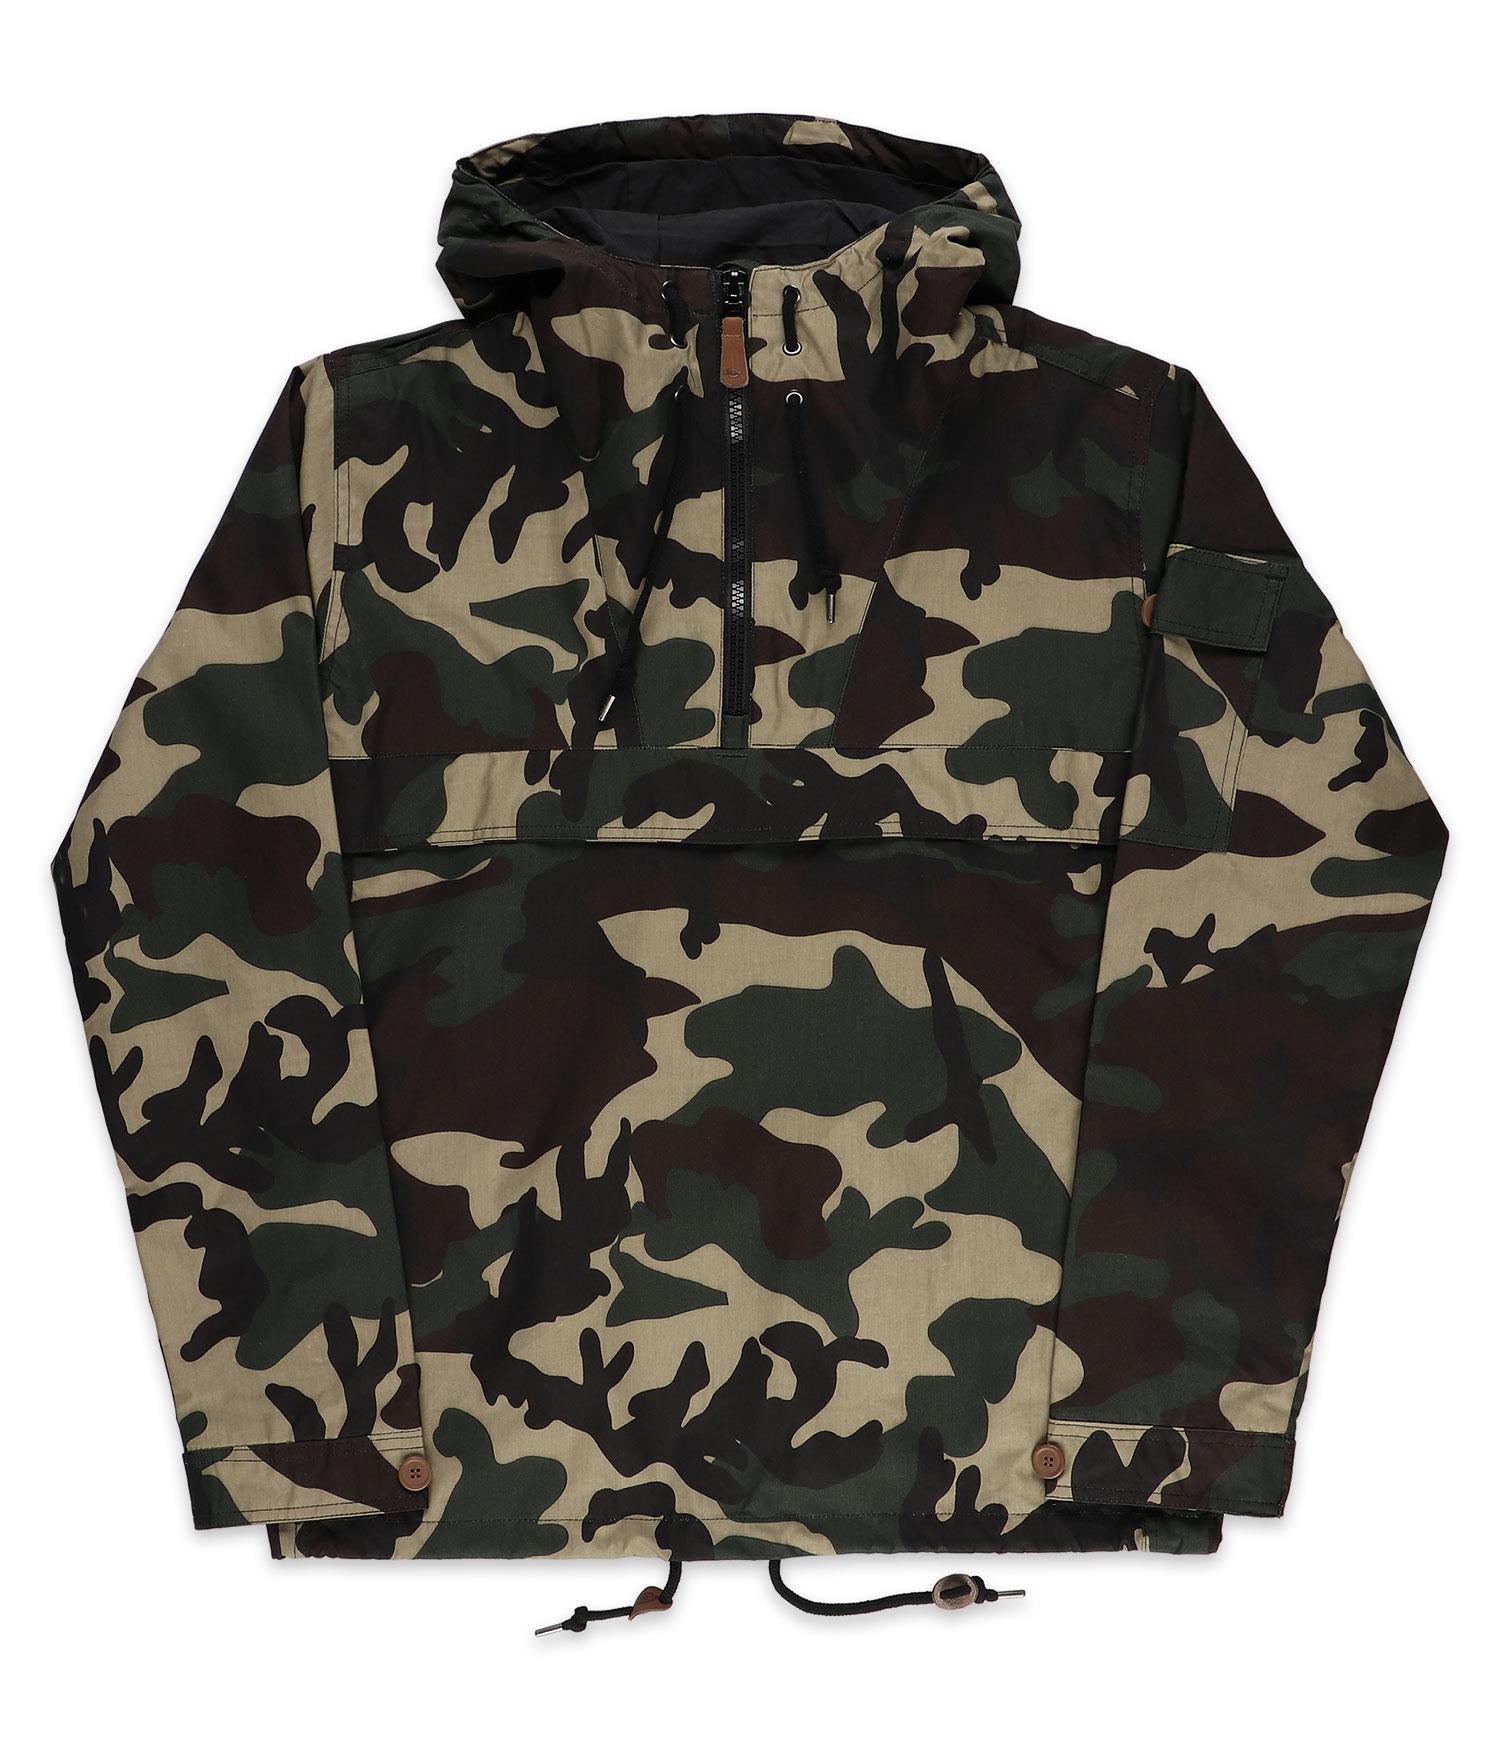 Veste Skatedeluxe Pollard Achetez camouflage Dickies Sur 6w5q0px